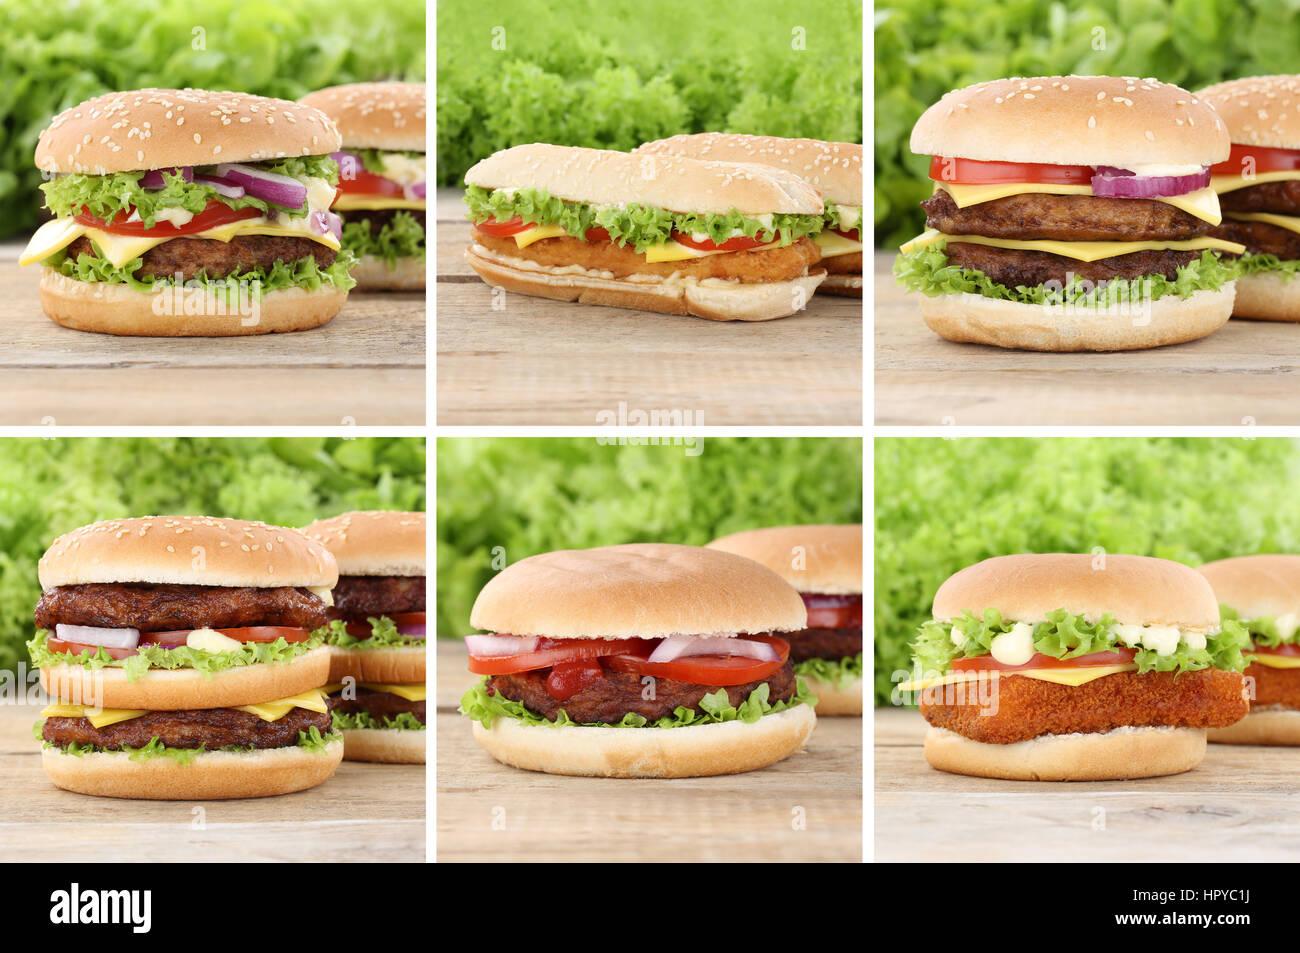 Ensemble de collection cheeseburger hamburger au fromage Tomates de mauvaise alimentation Photo Stock